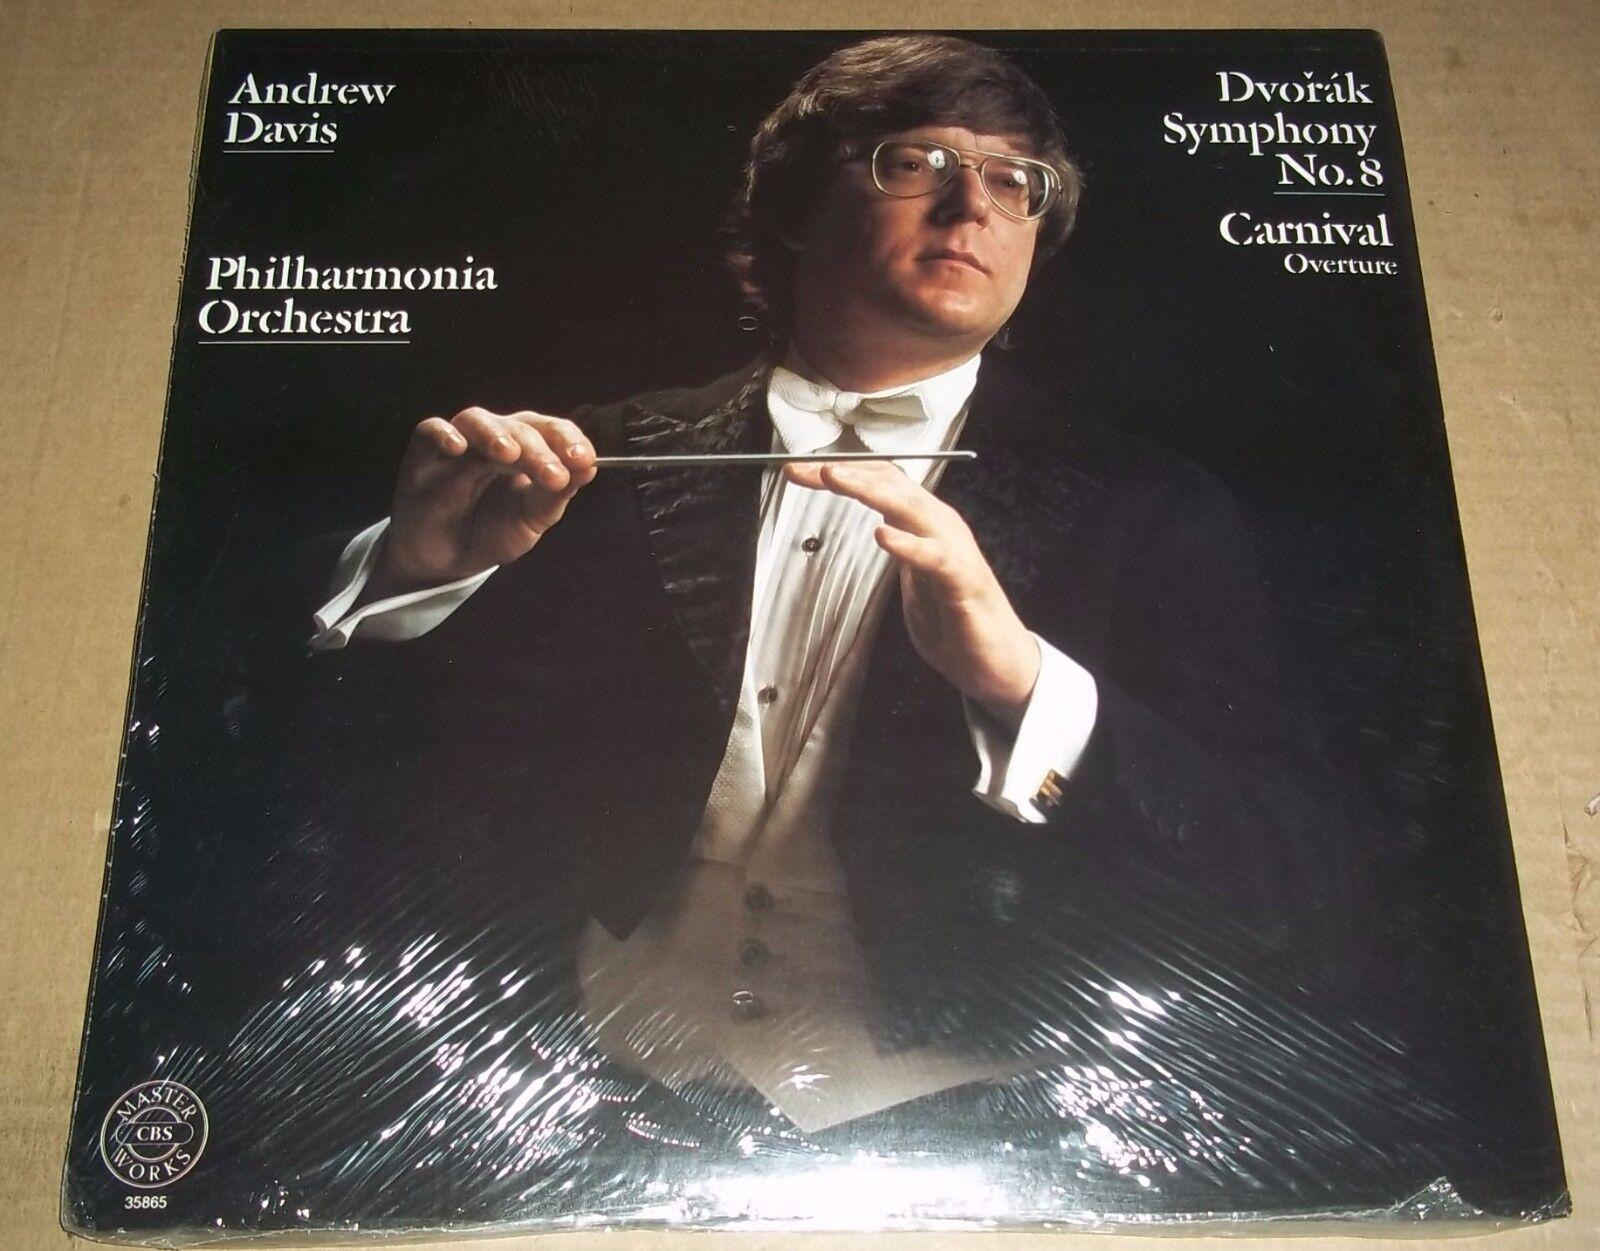 Andrew Davis DVORAK Symphony No.8, Carnival Overture - CBS 35865 SEALED